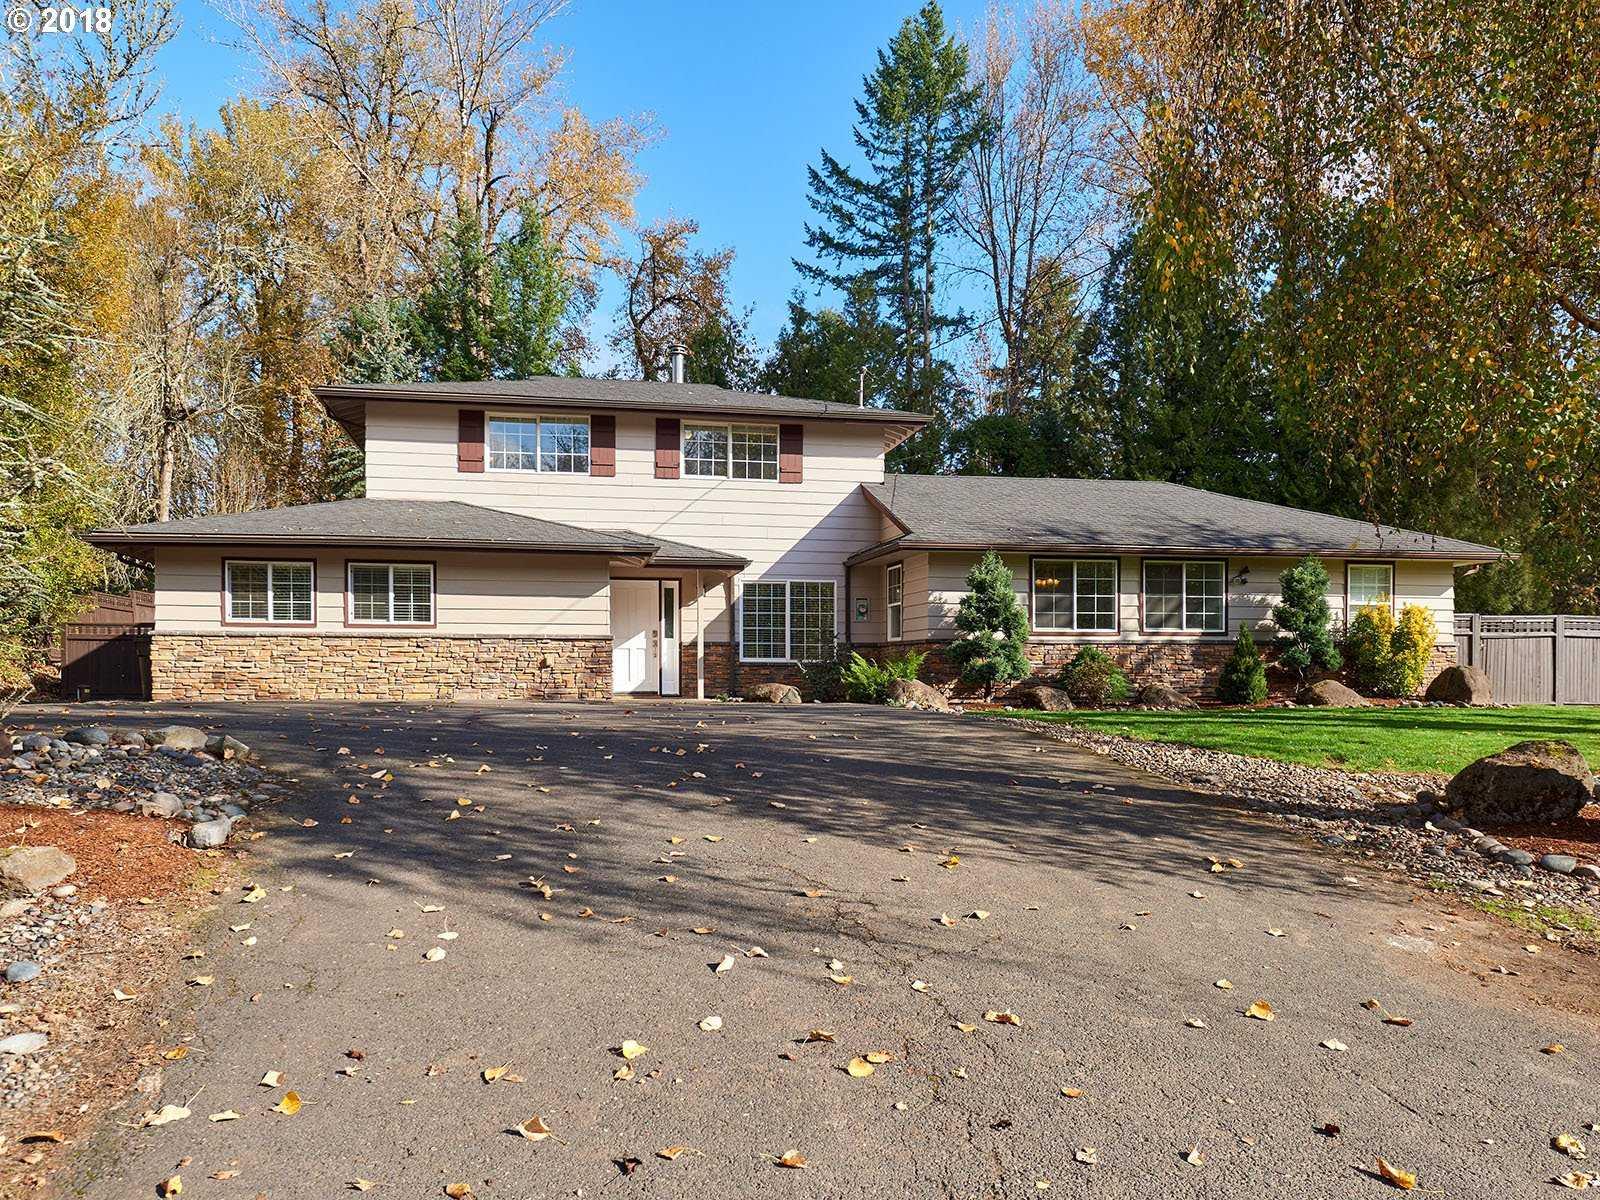 $454,900 - 4Br/3Ba -  for Sale in Gresham - Mt. Hood, Gresham